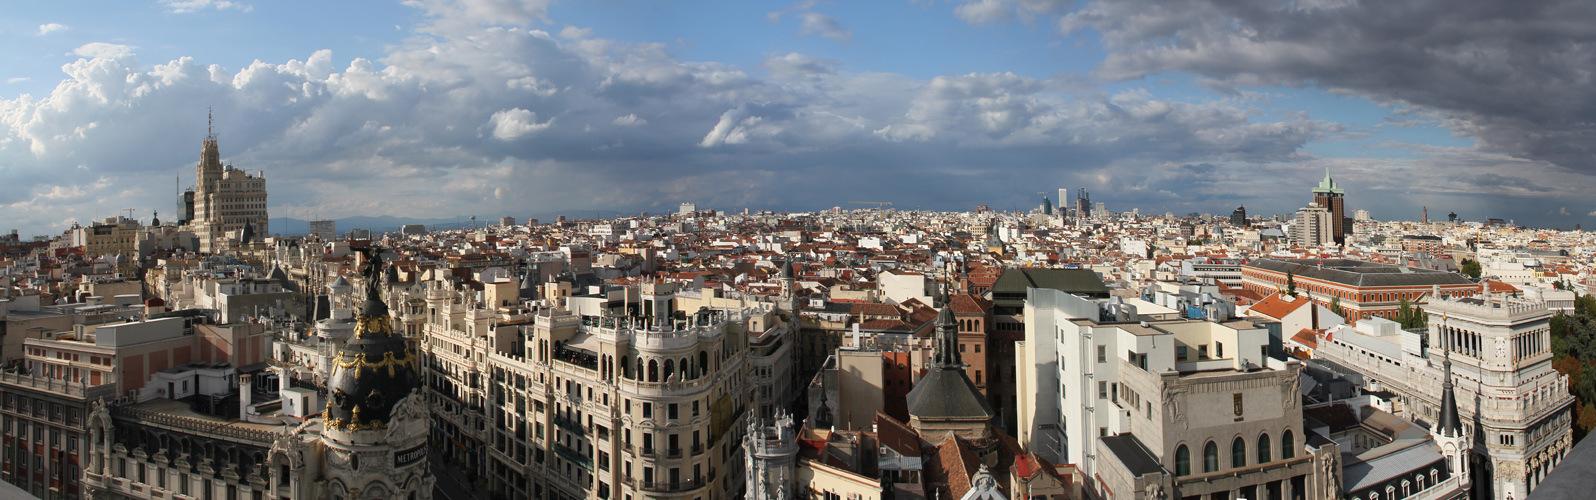 MADRID - GK-5